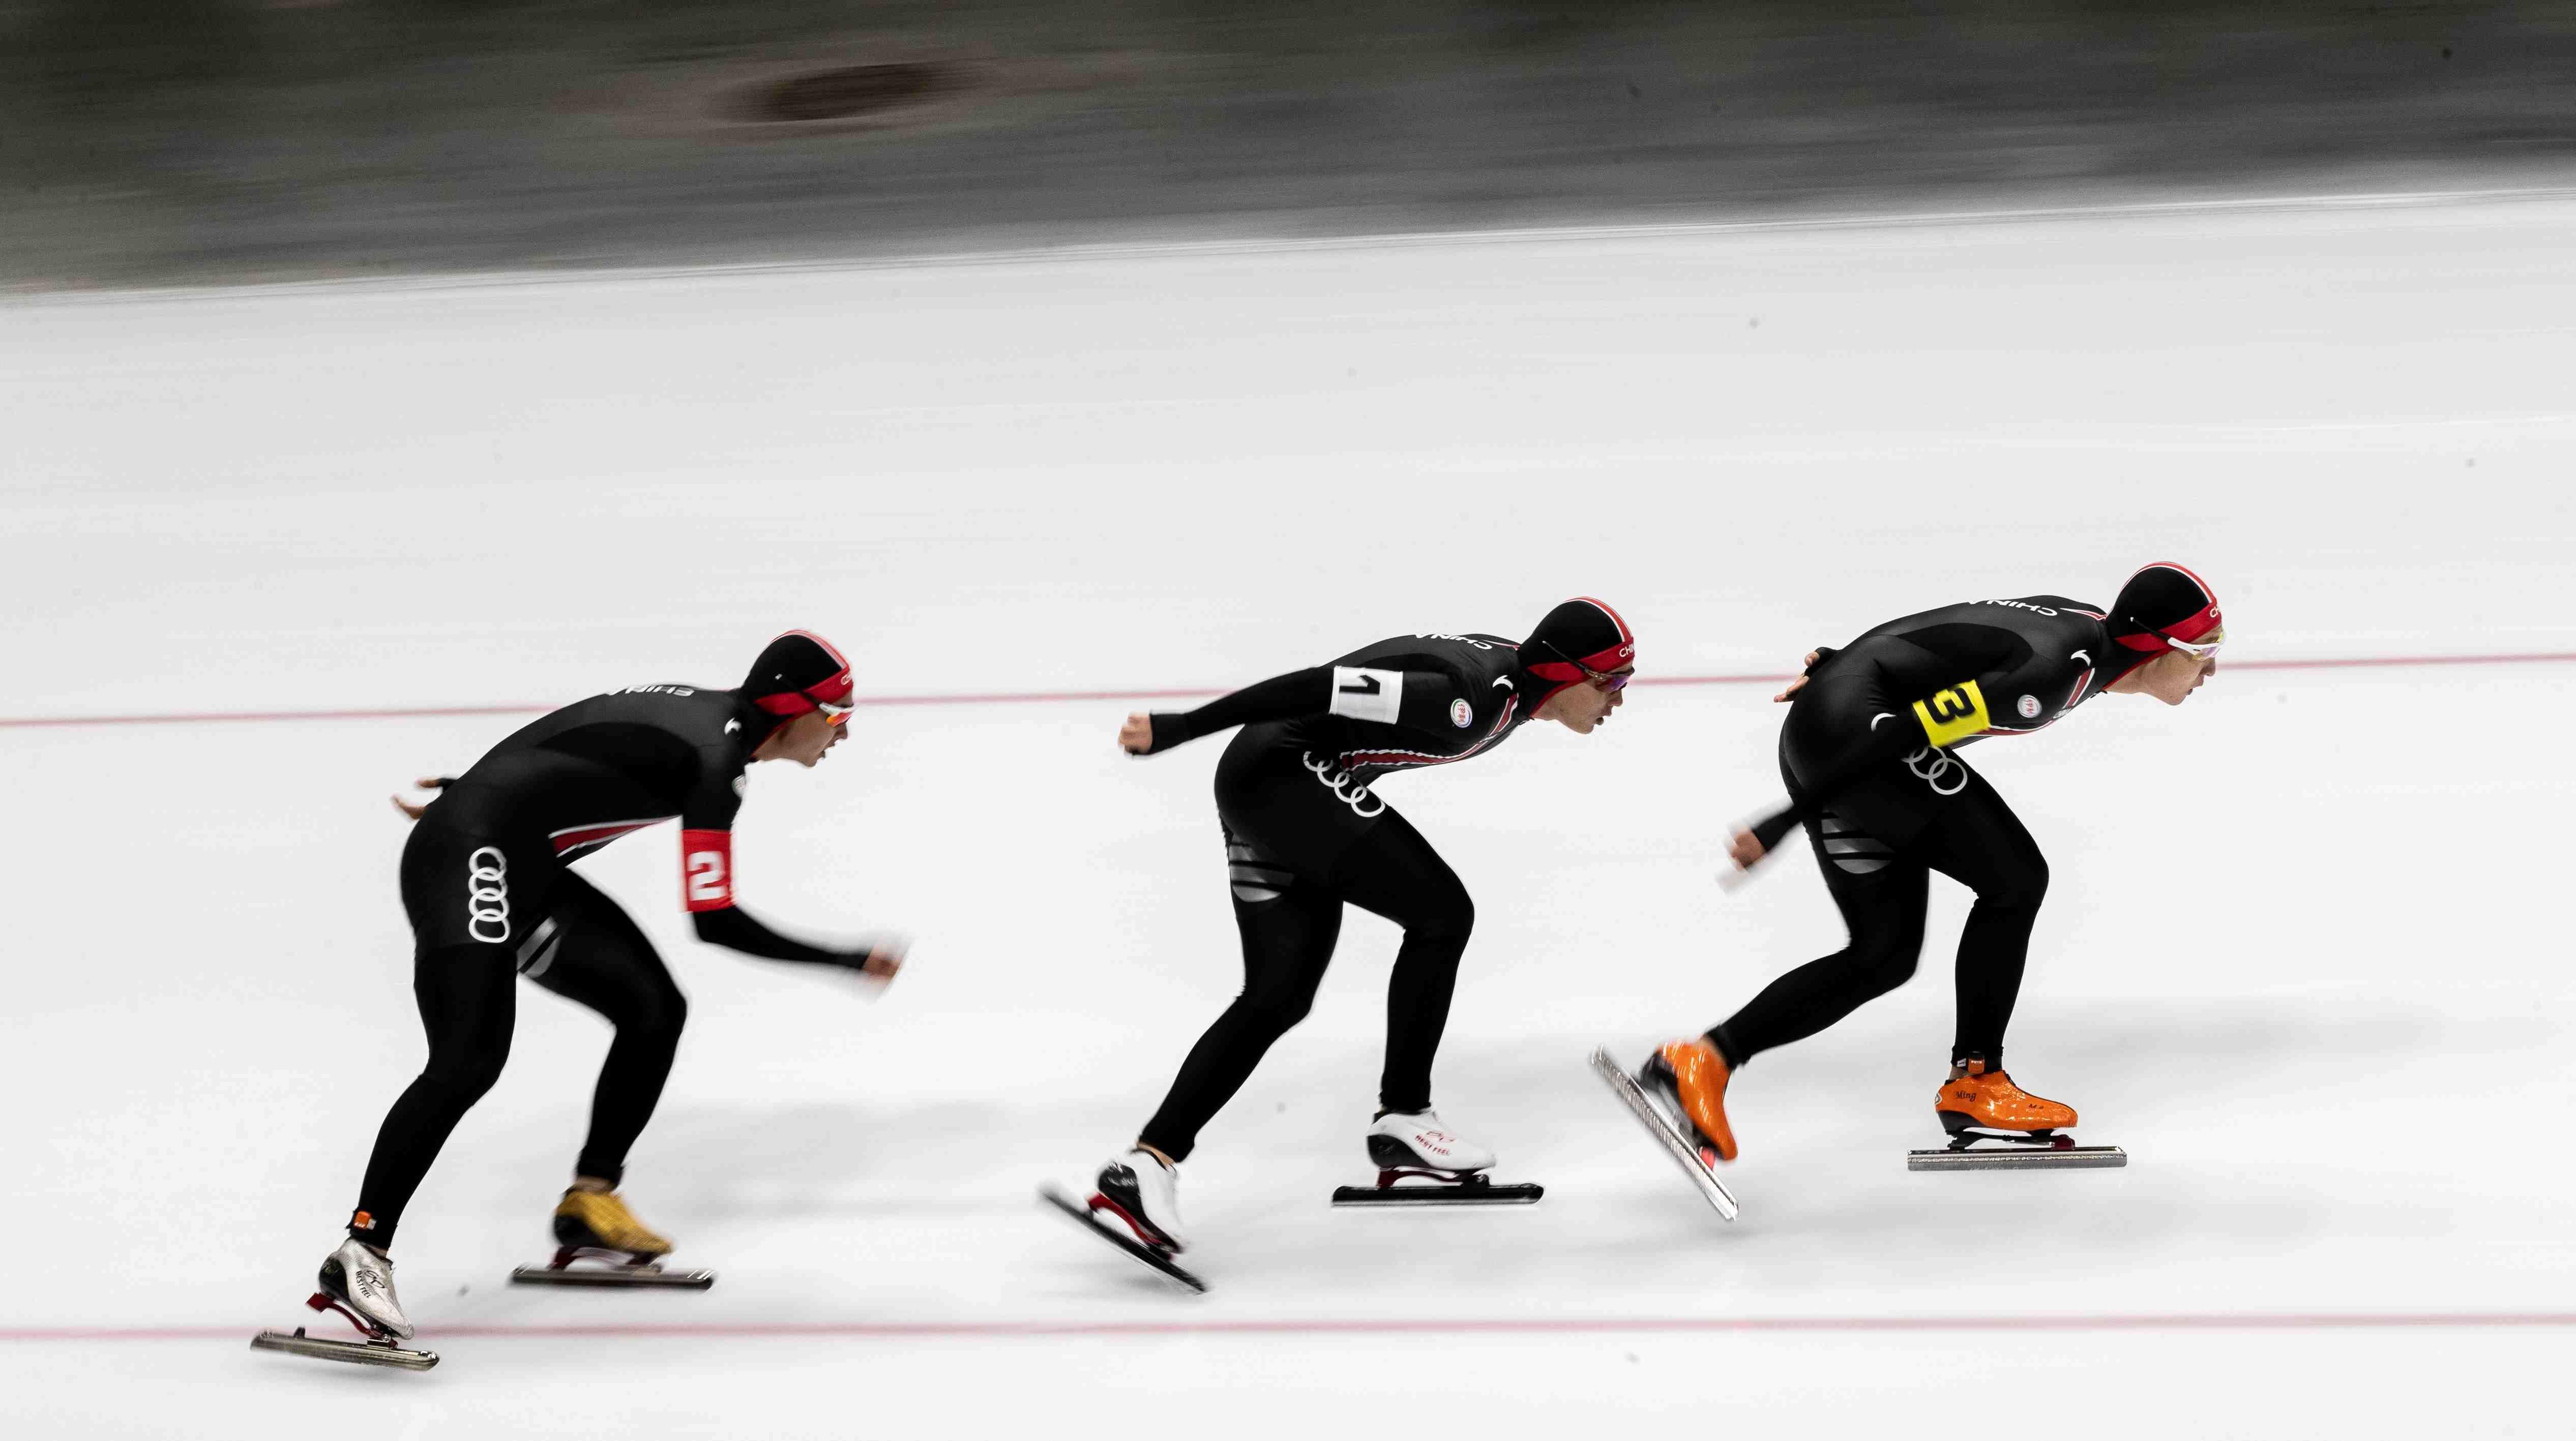 International Skating Union updates event calendar in 2021